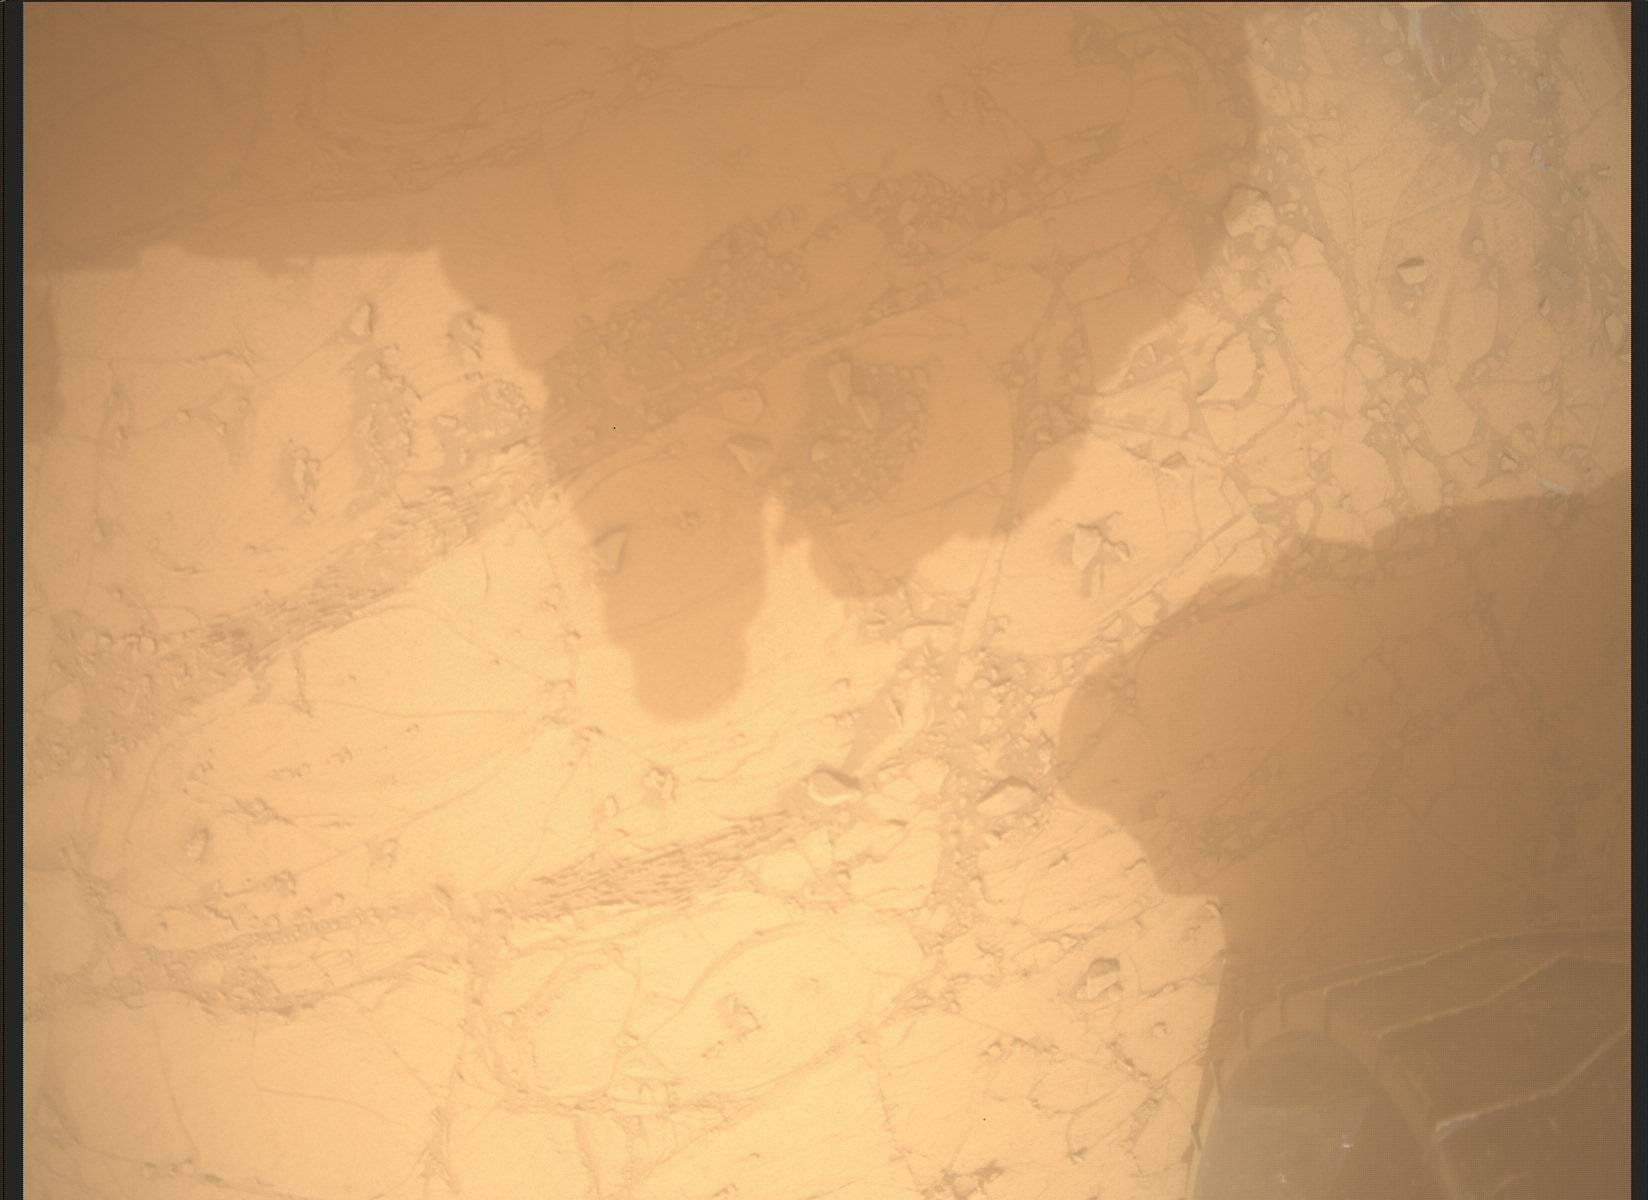 Image taken by Mars Descent Imager